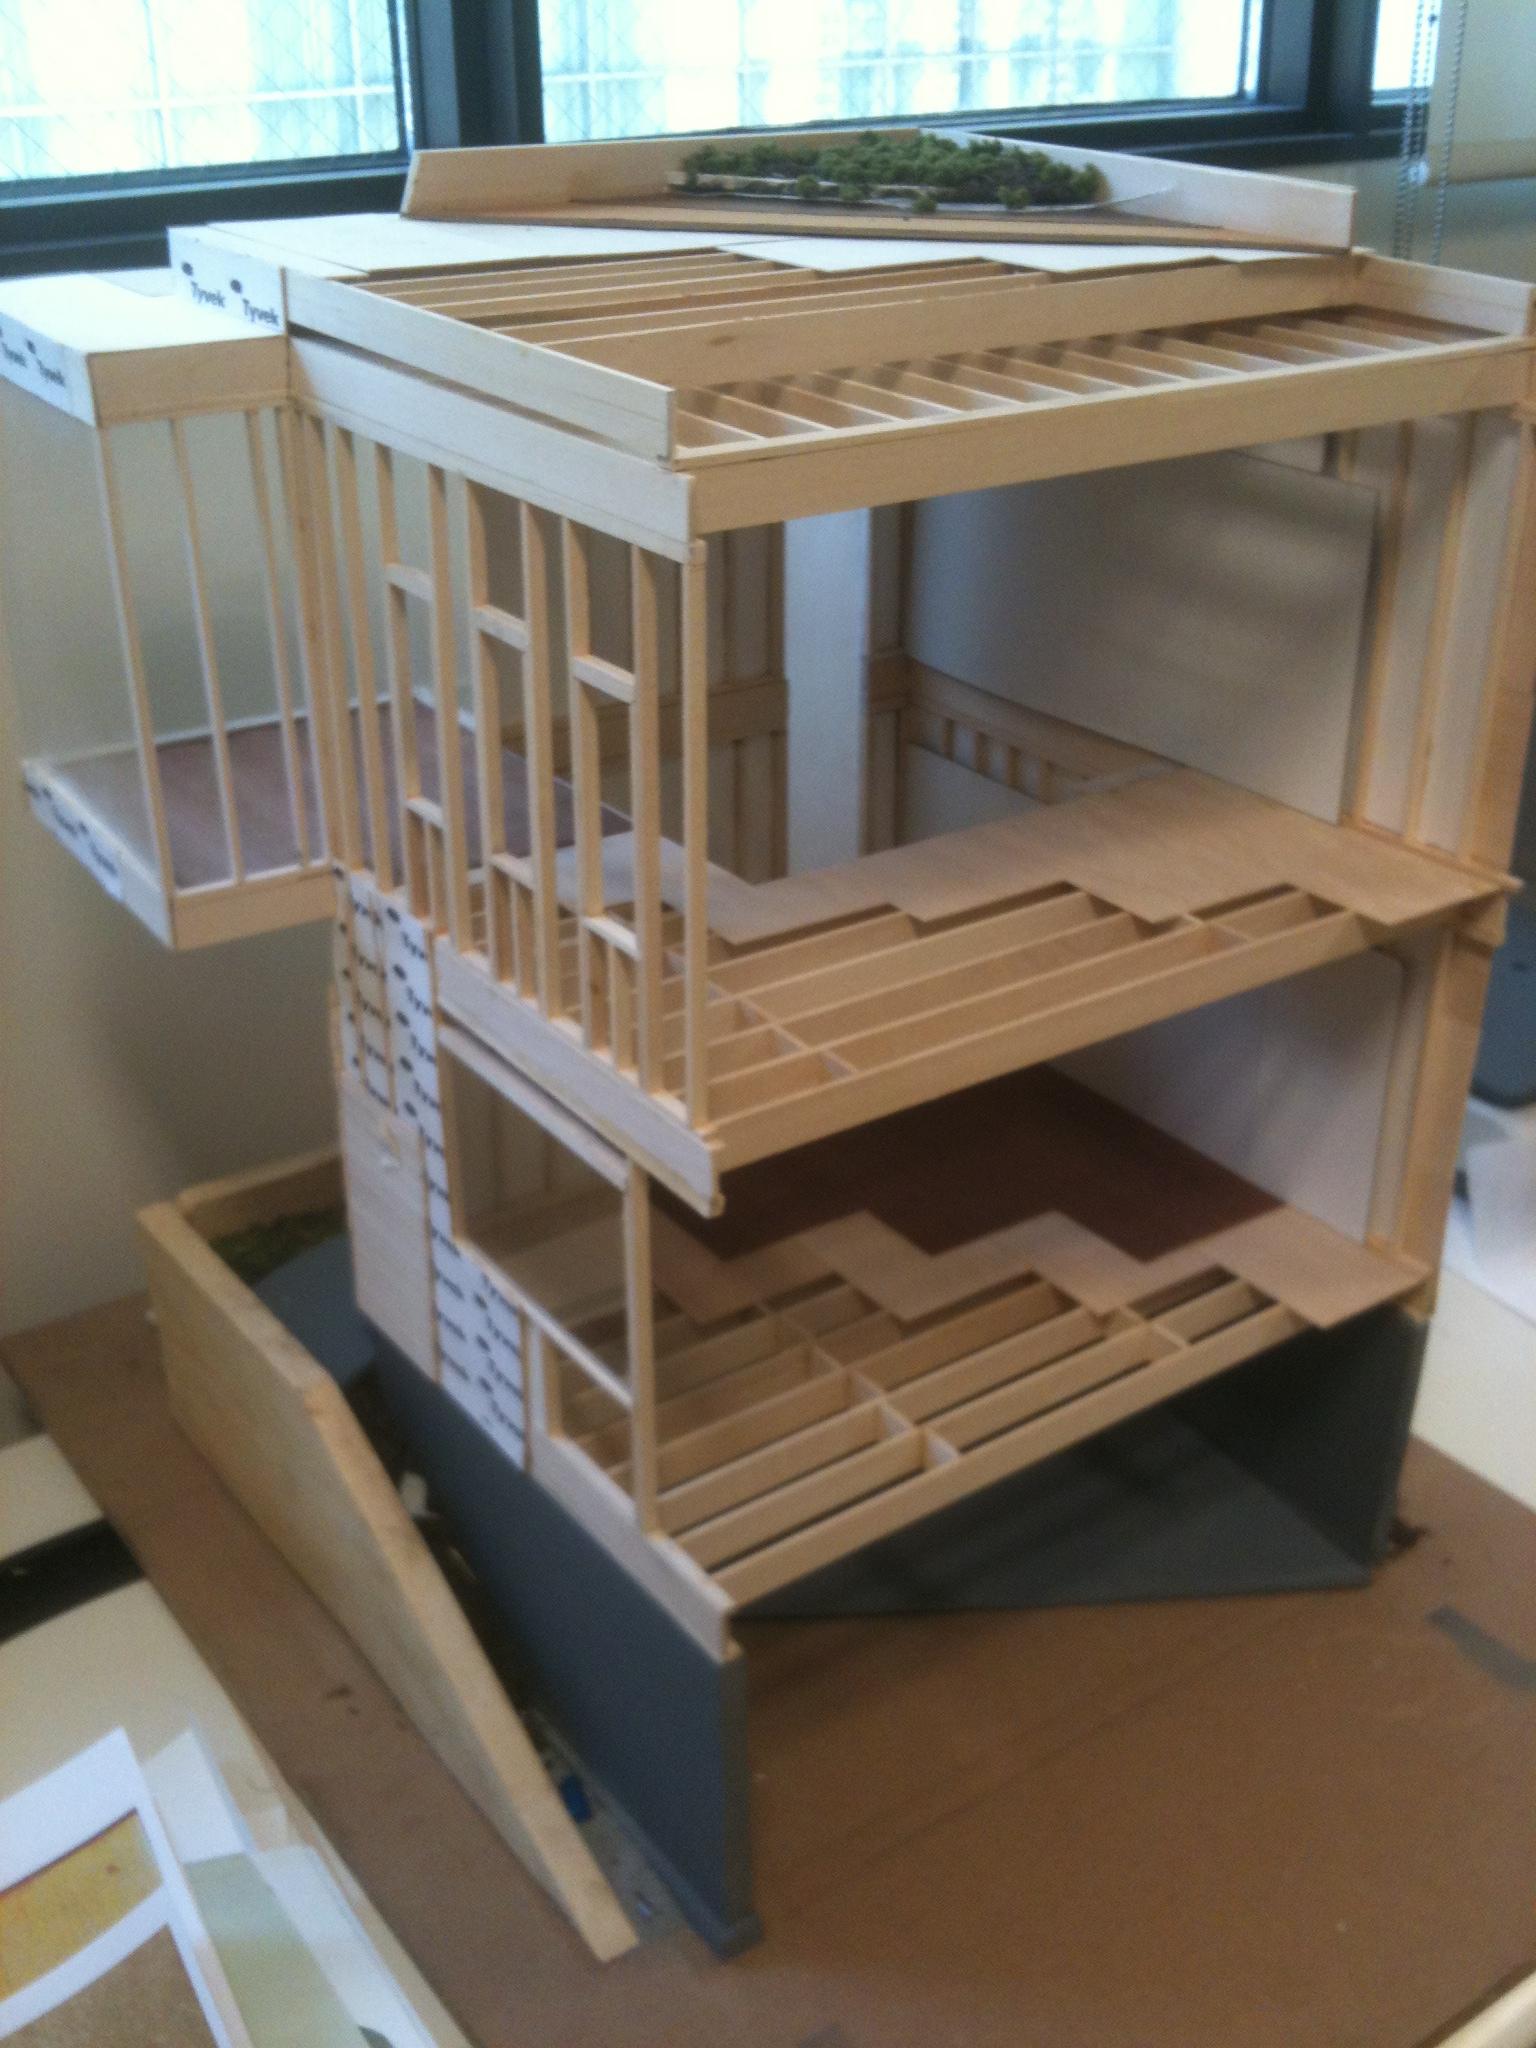 Residential Construction 3-D Model